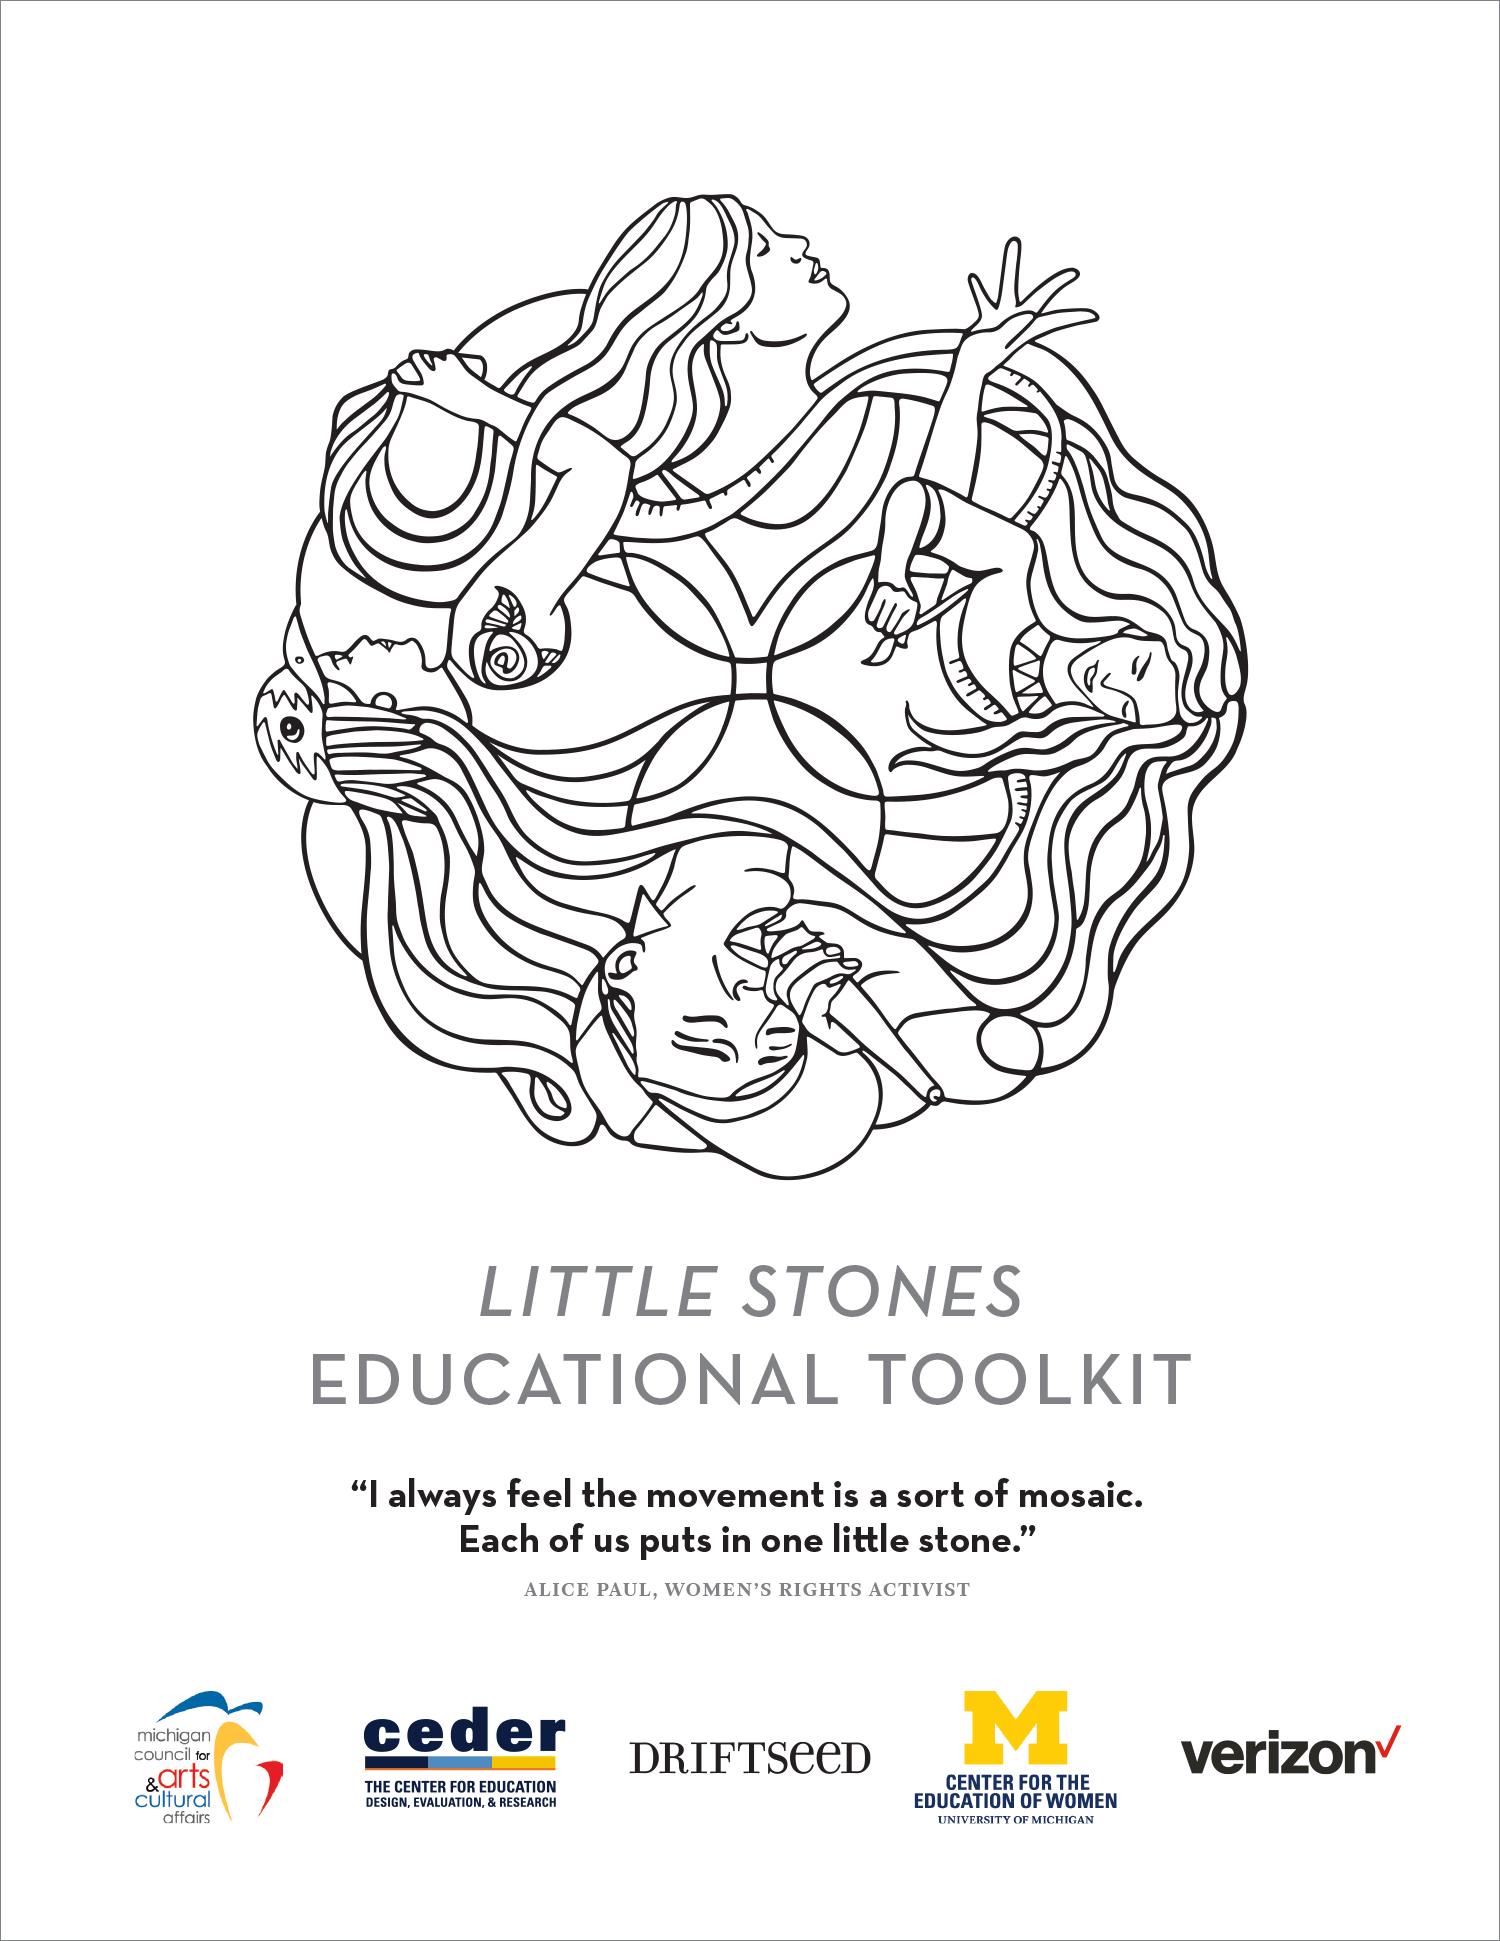 littlestones_toolkit-01.png